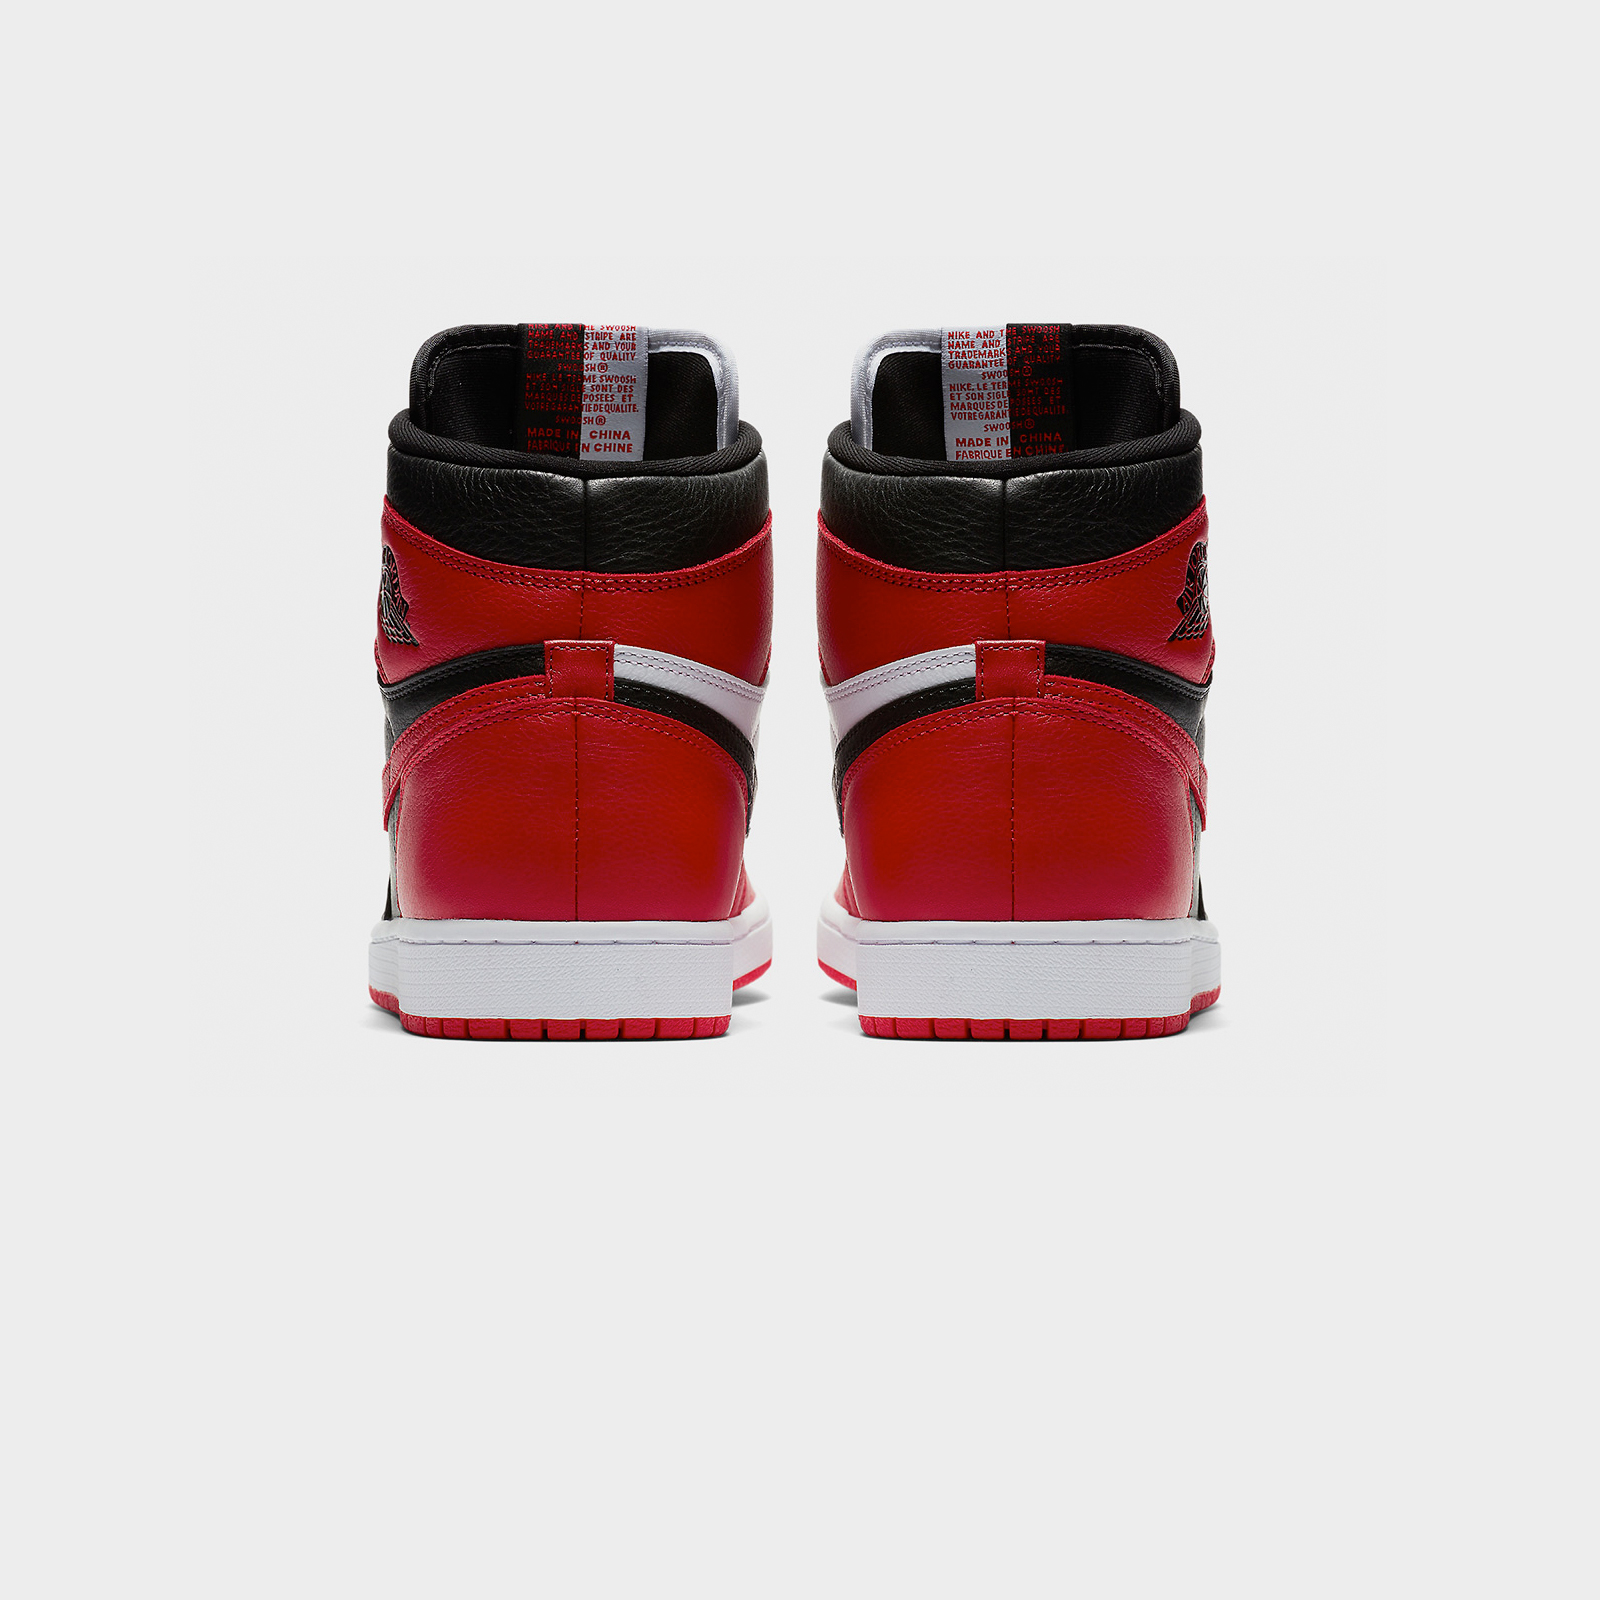 official photos dd6a6 05f36 Jordan Brand Air Jordan 1 Retro High OG NRG - 861428-061 - Sneakersnstuff    sneakers   streetwear online since 1999